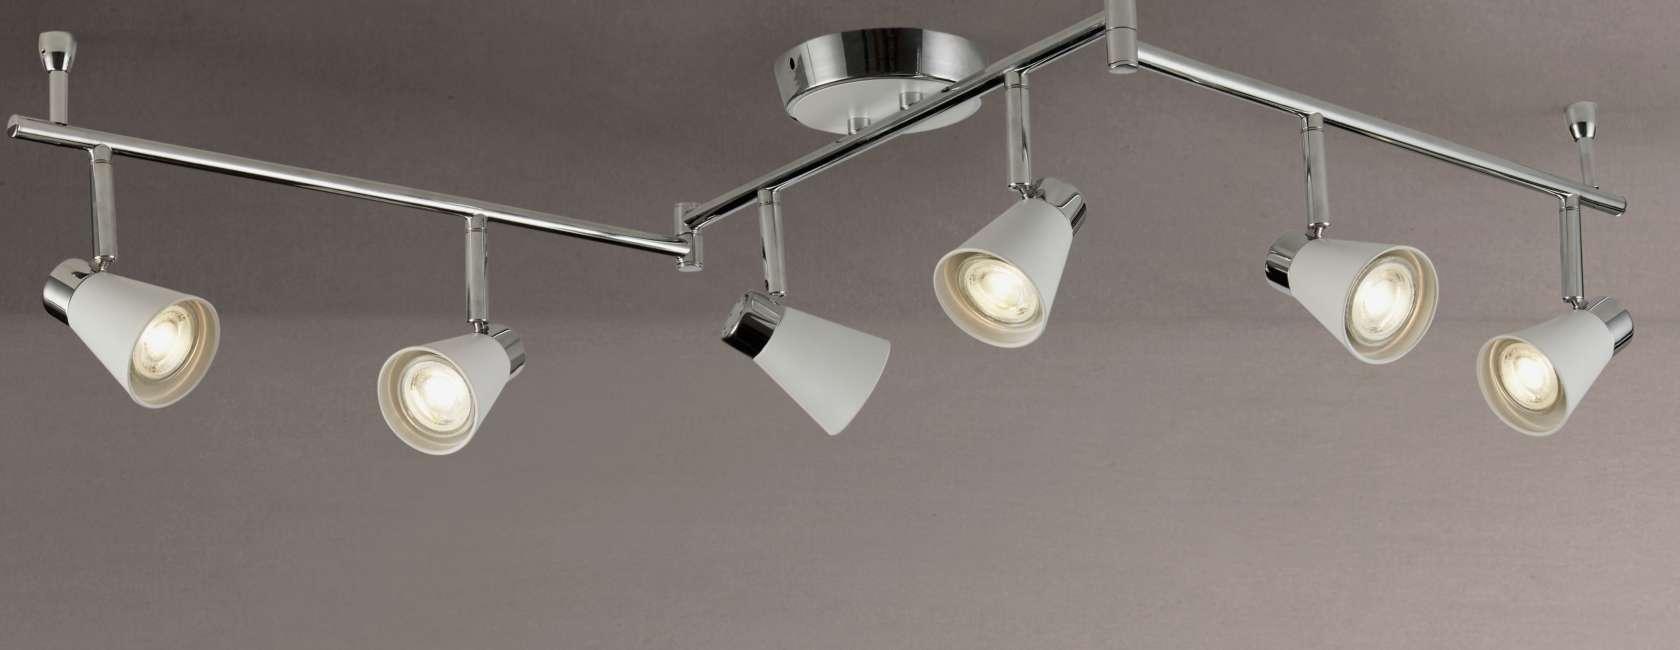 John Lewis Partners Logan Lighting Collection